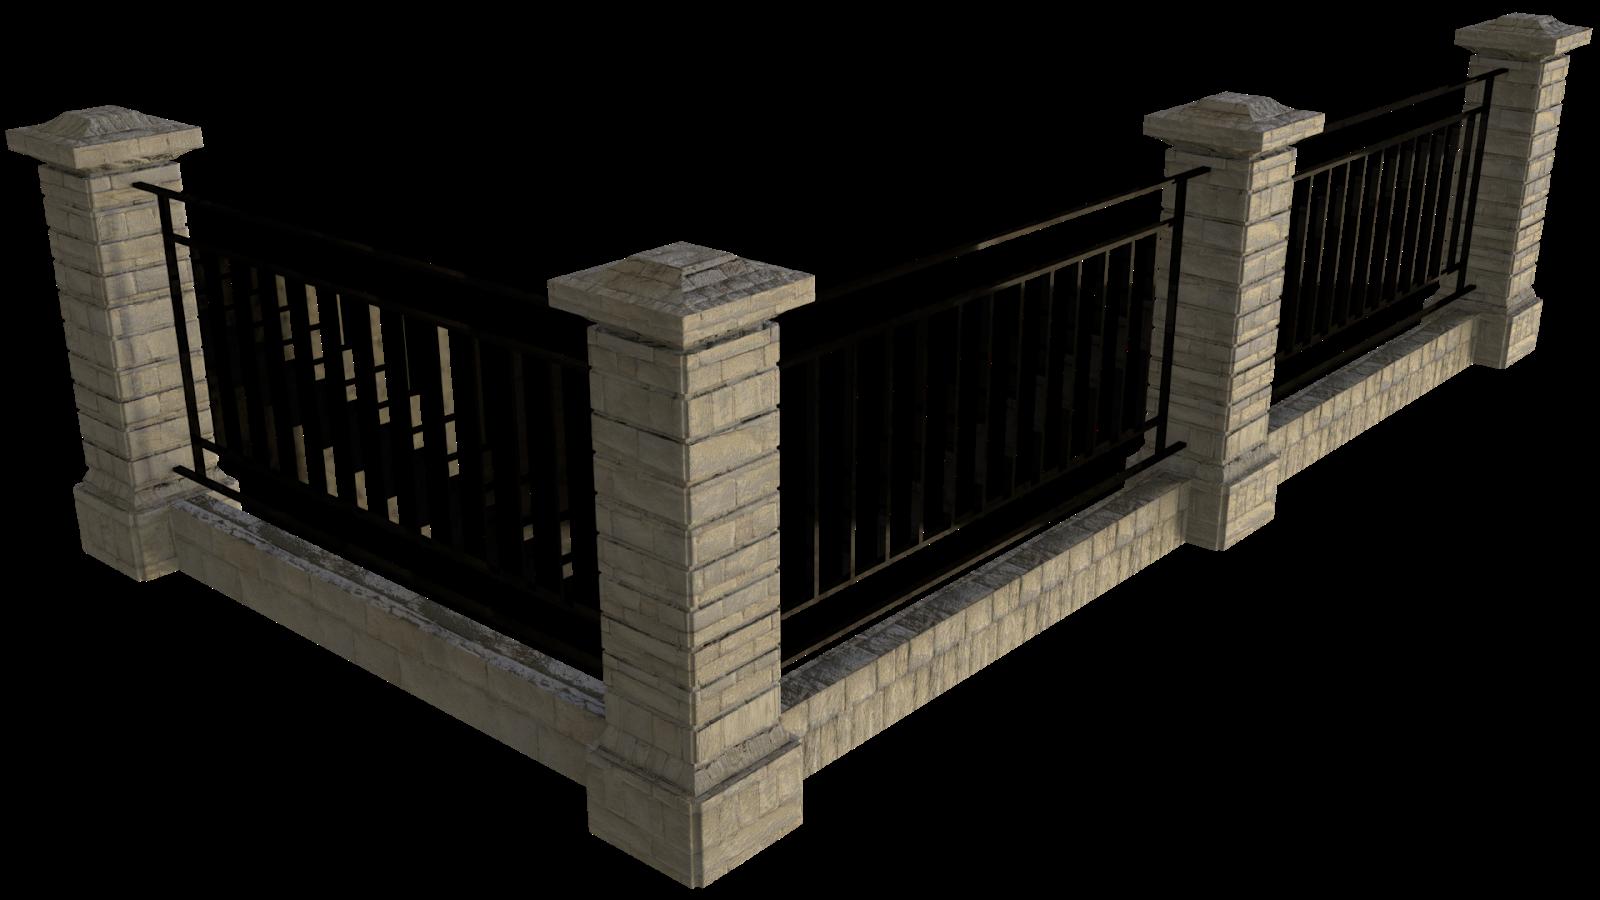 Free 3D Wall Fence CC0 3DS - Free 3D Models Under Public Domain